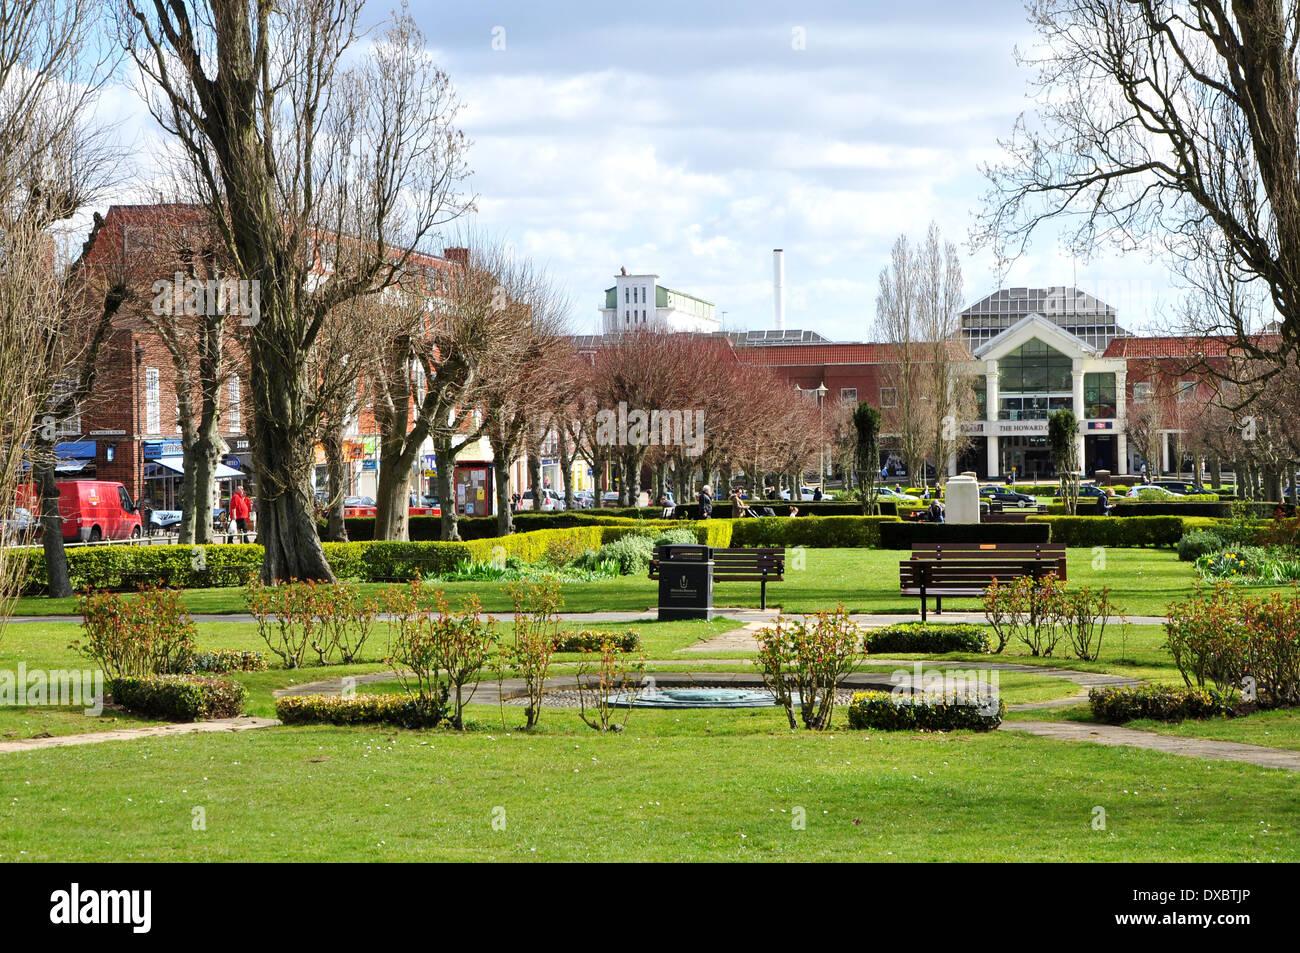 Landscape Welwyn Garden City : Welwyn garden city town centre stock photo royalty free